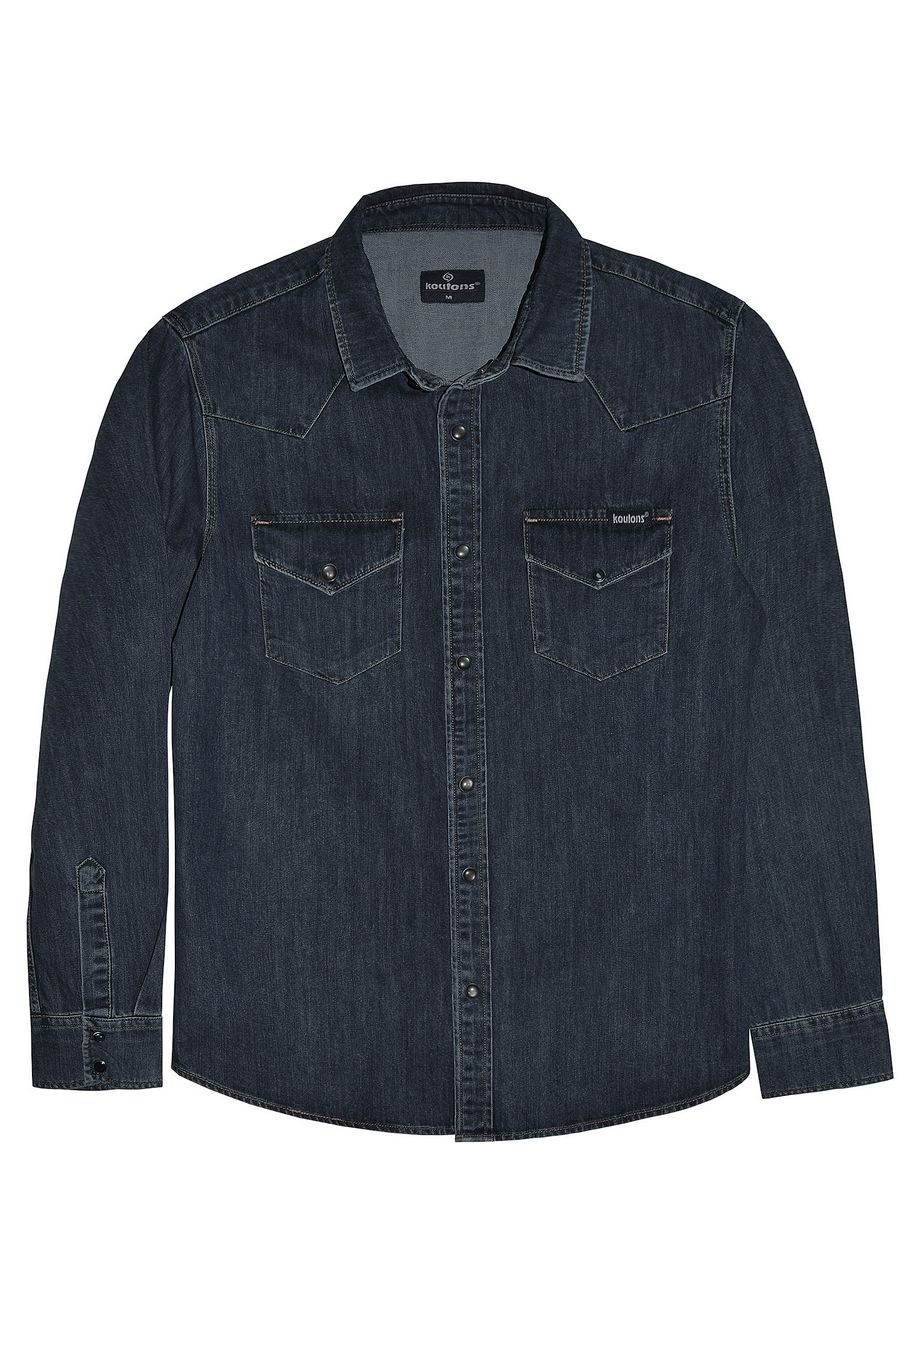 Рубашка мужская Koutons 1997 Talin Black 02 - фото 1